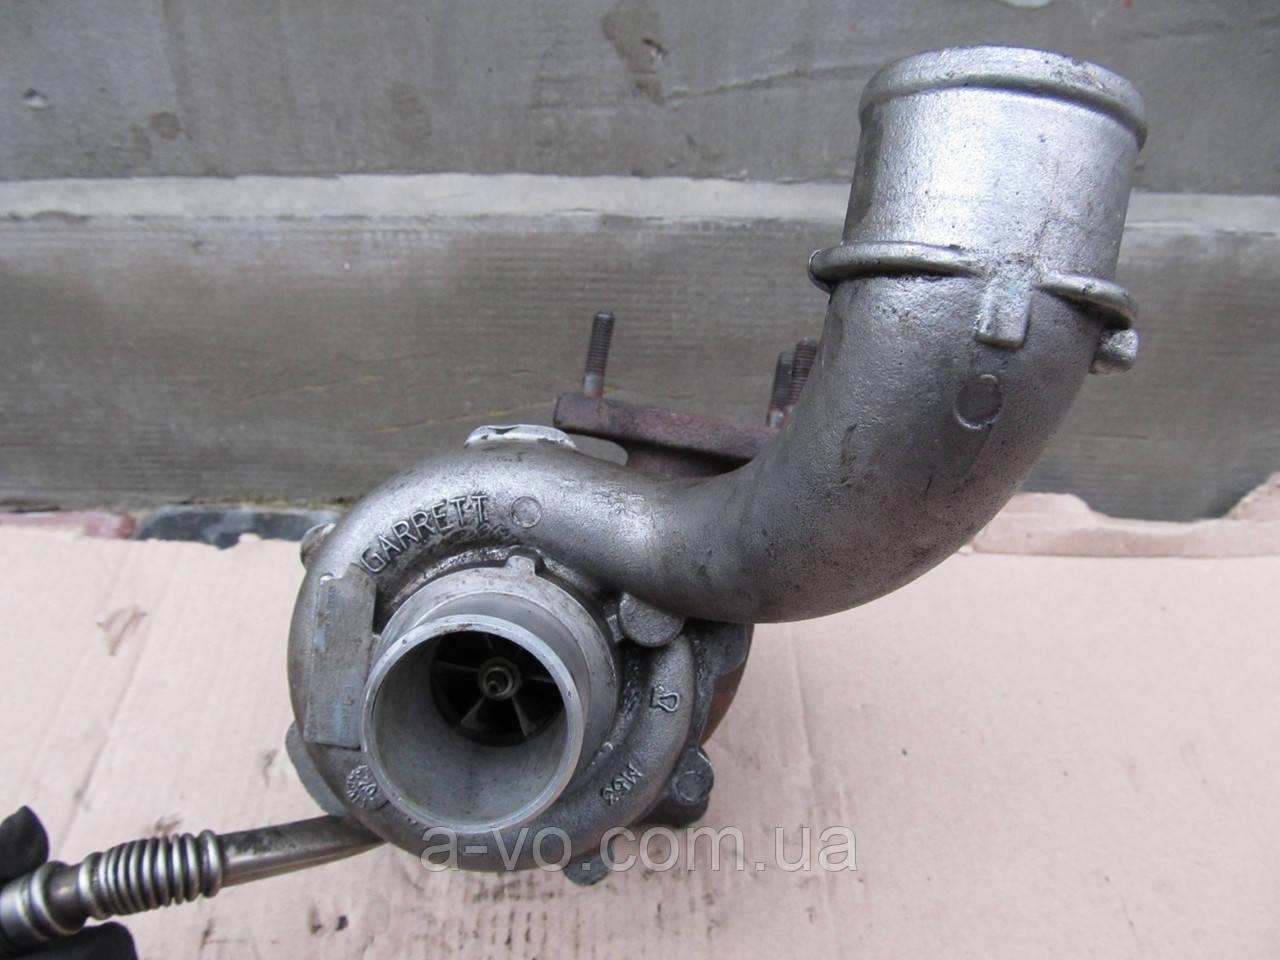 Турбина для Renault Espace 3 2.2DCi, 8200178919, GT1549F